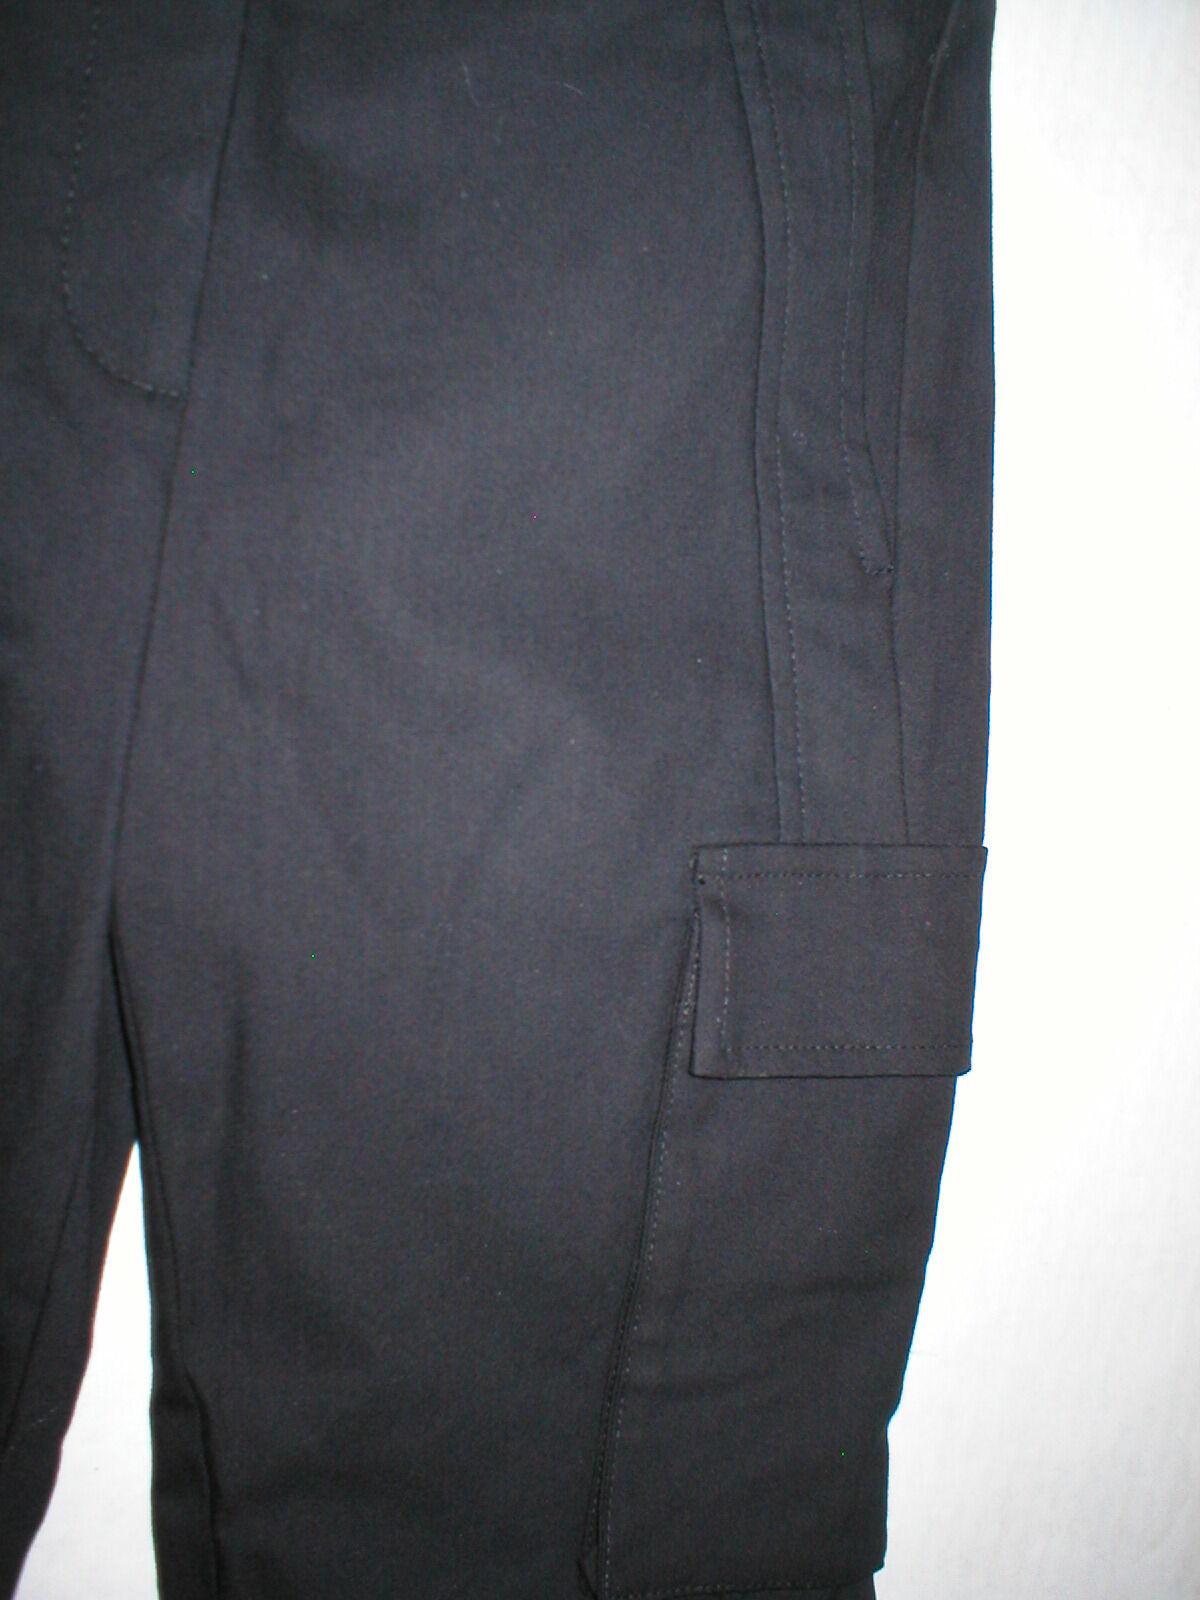 New Womens Designer NWT LAMB Gwen Stefani Cargo Pants Stretch Skinny 6 Black image 6